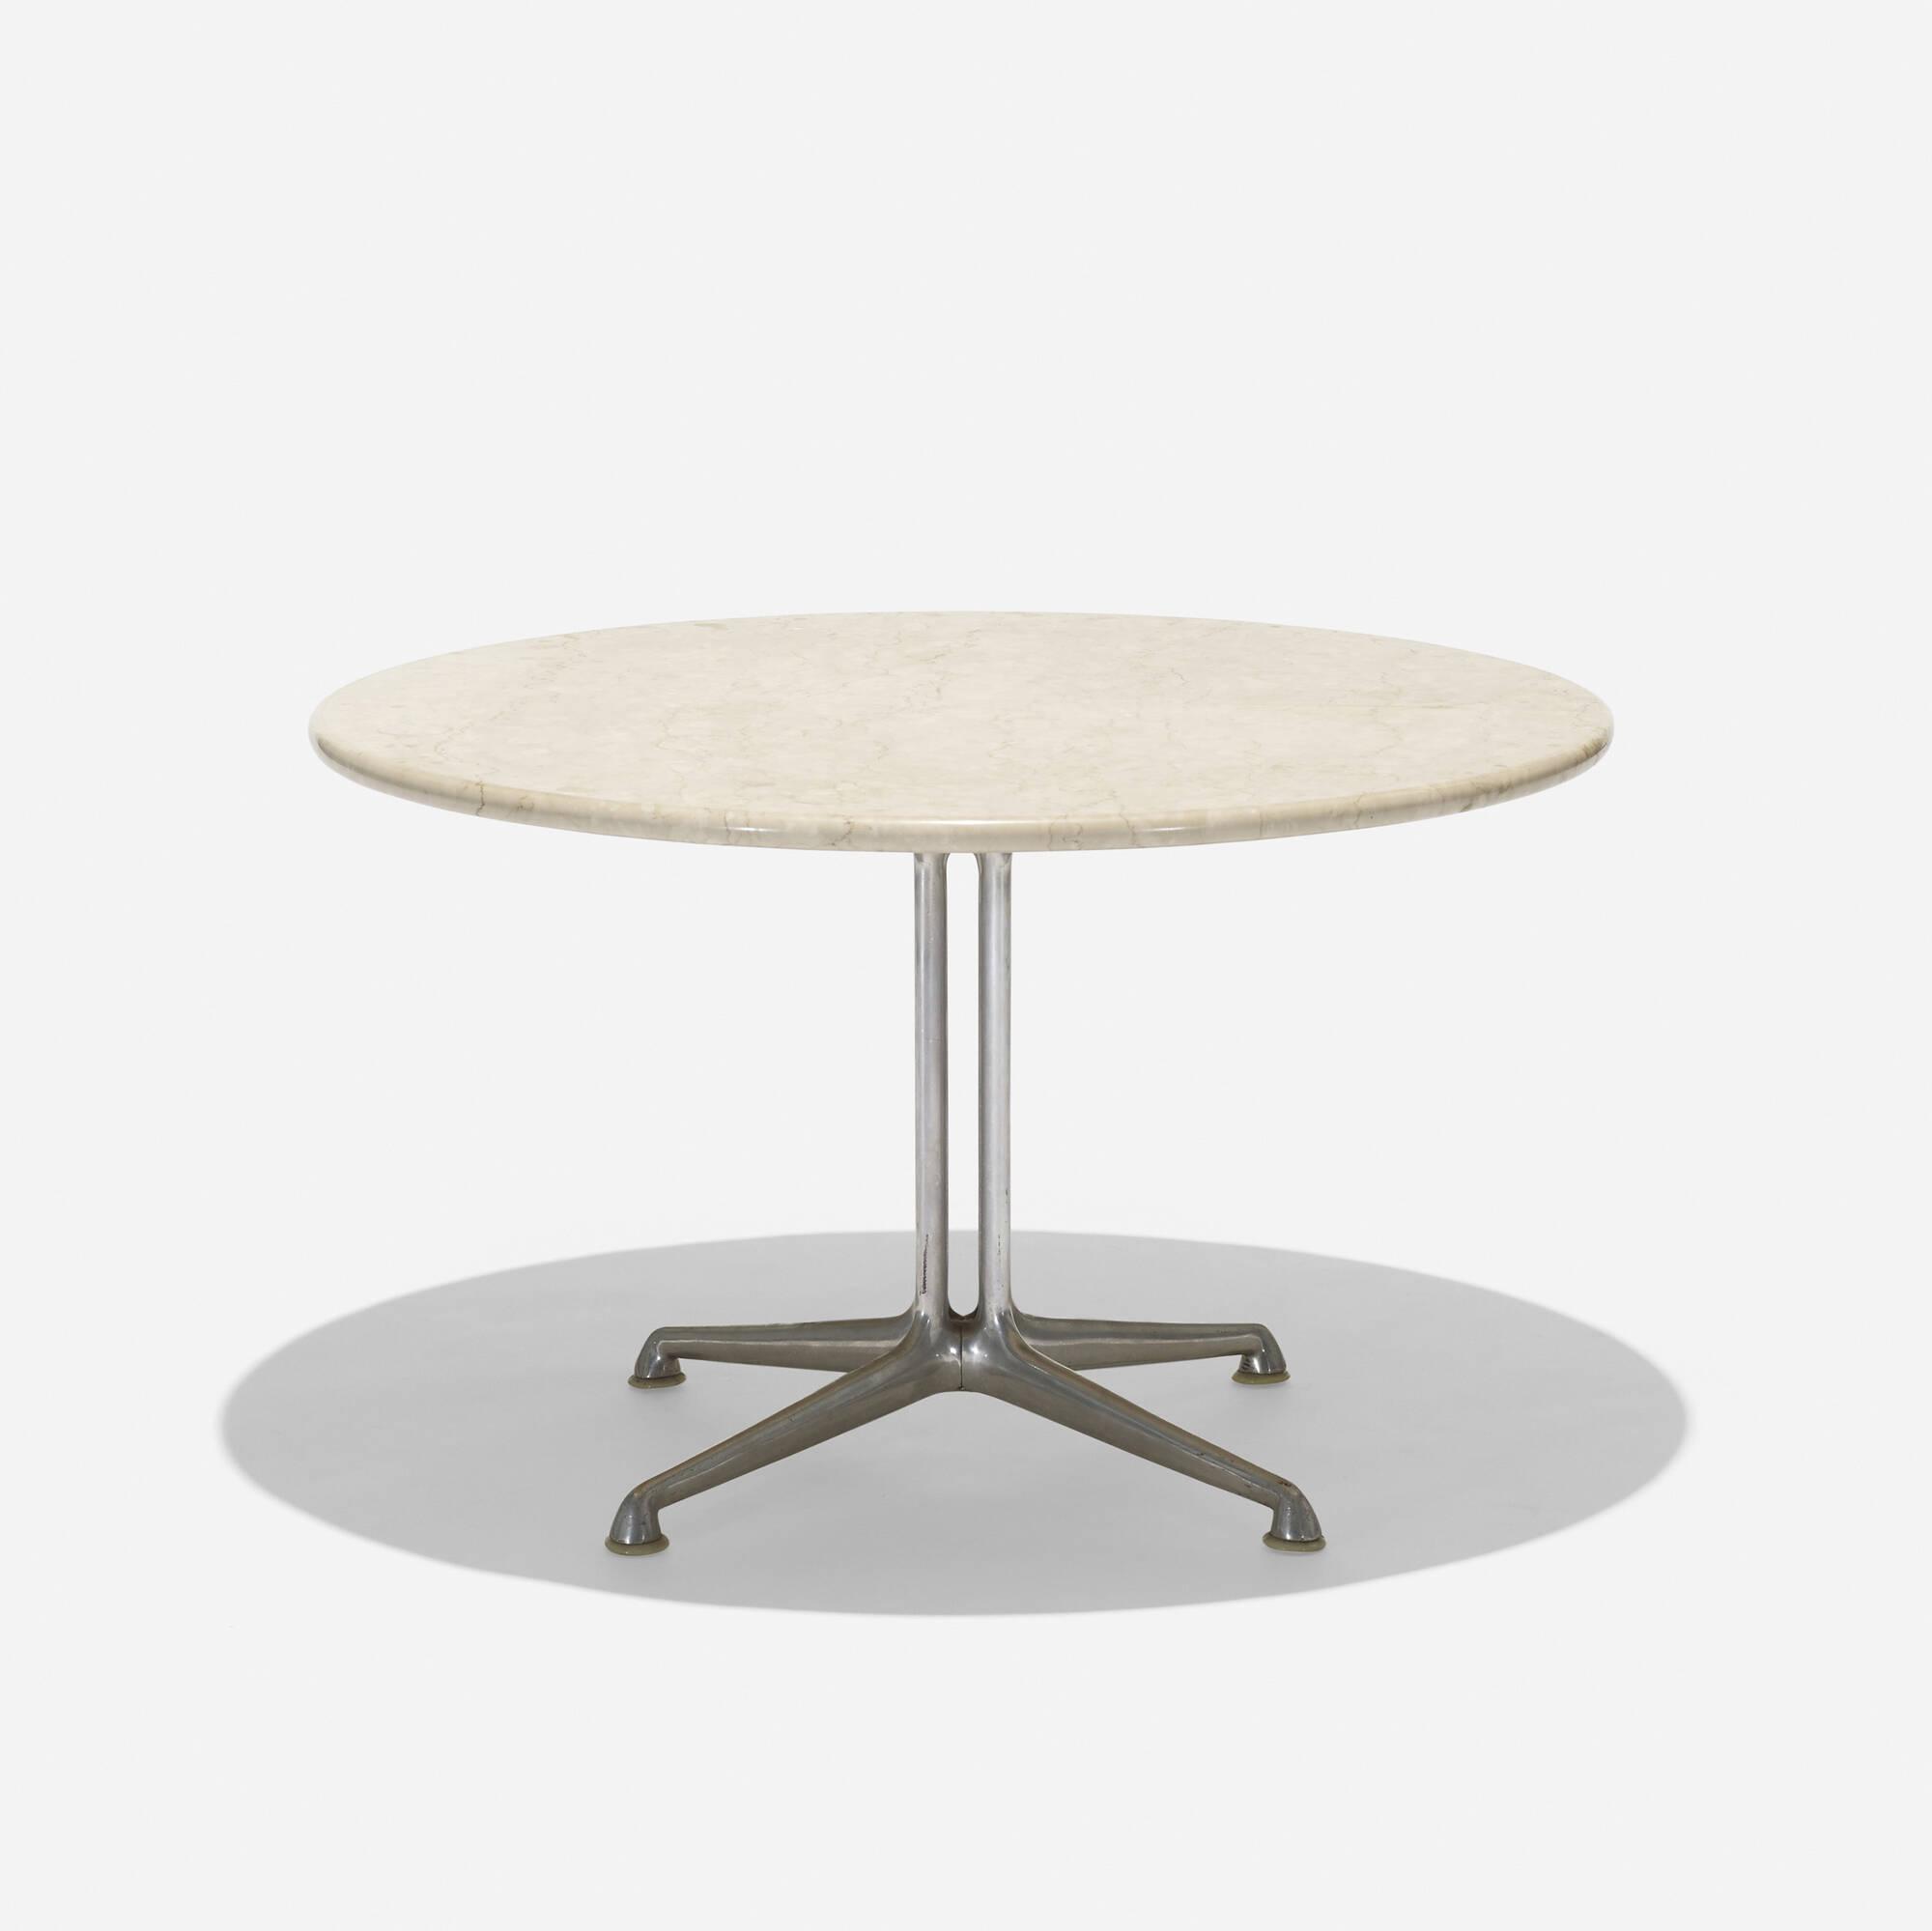 260 charles and ray eames la fonda coffee table eames design